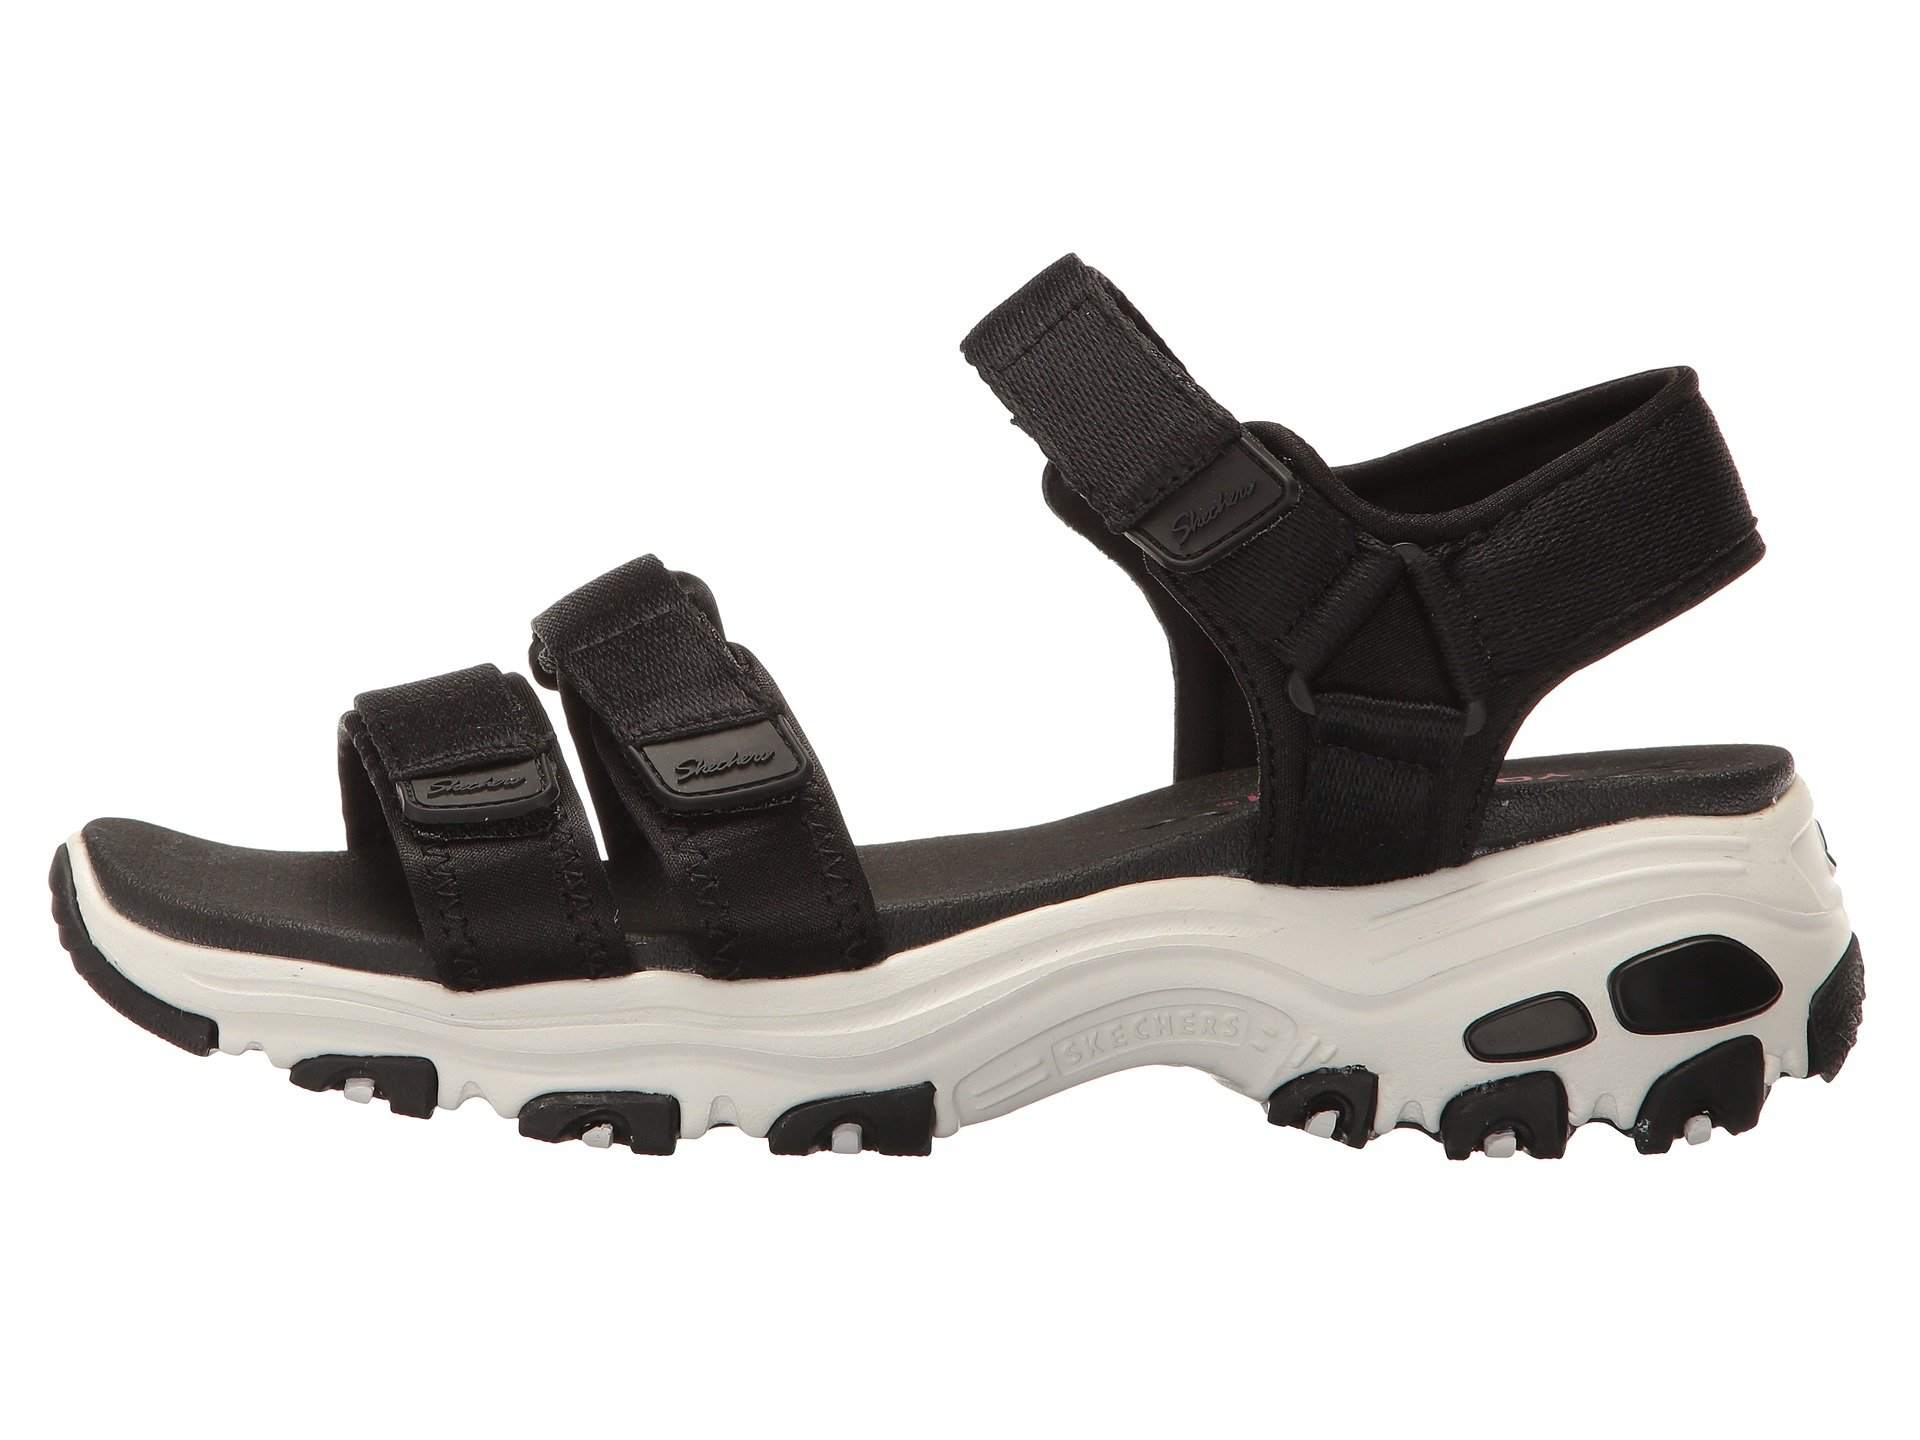 skechers d'lites sandals